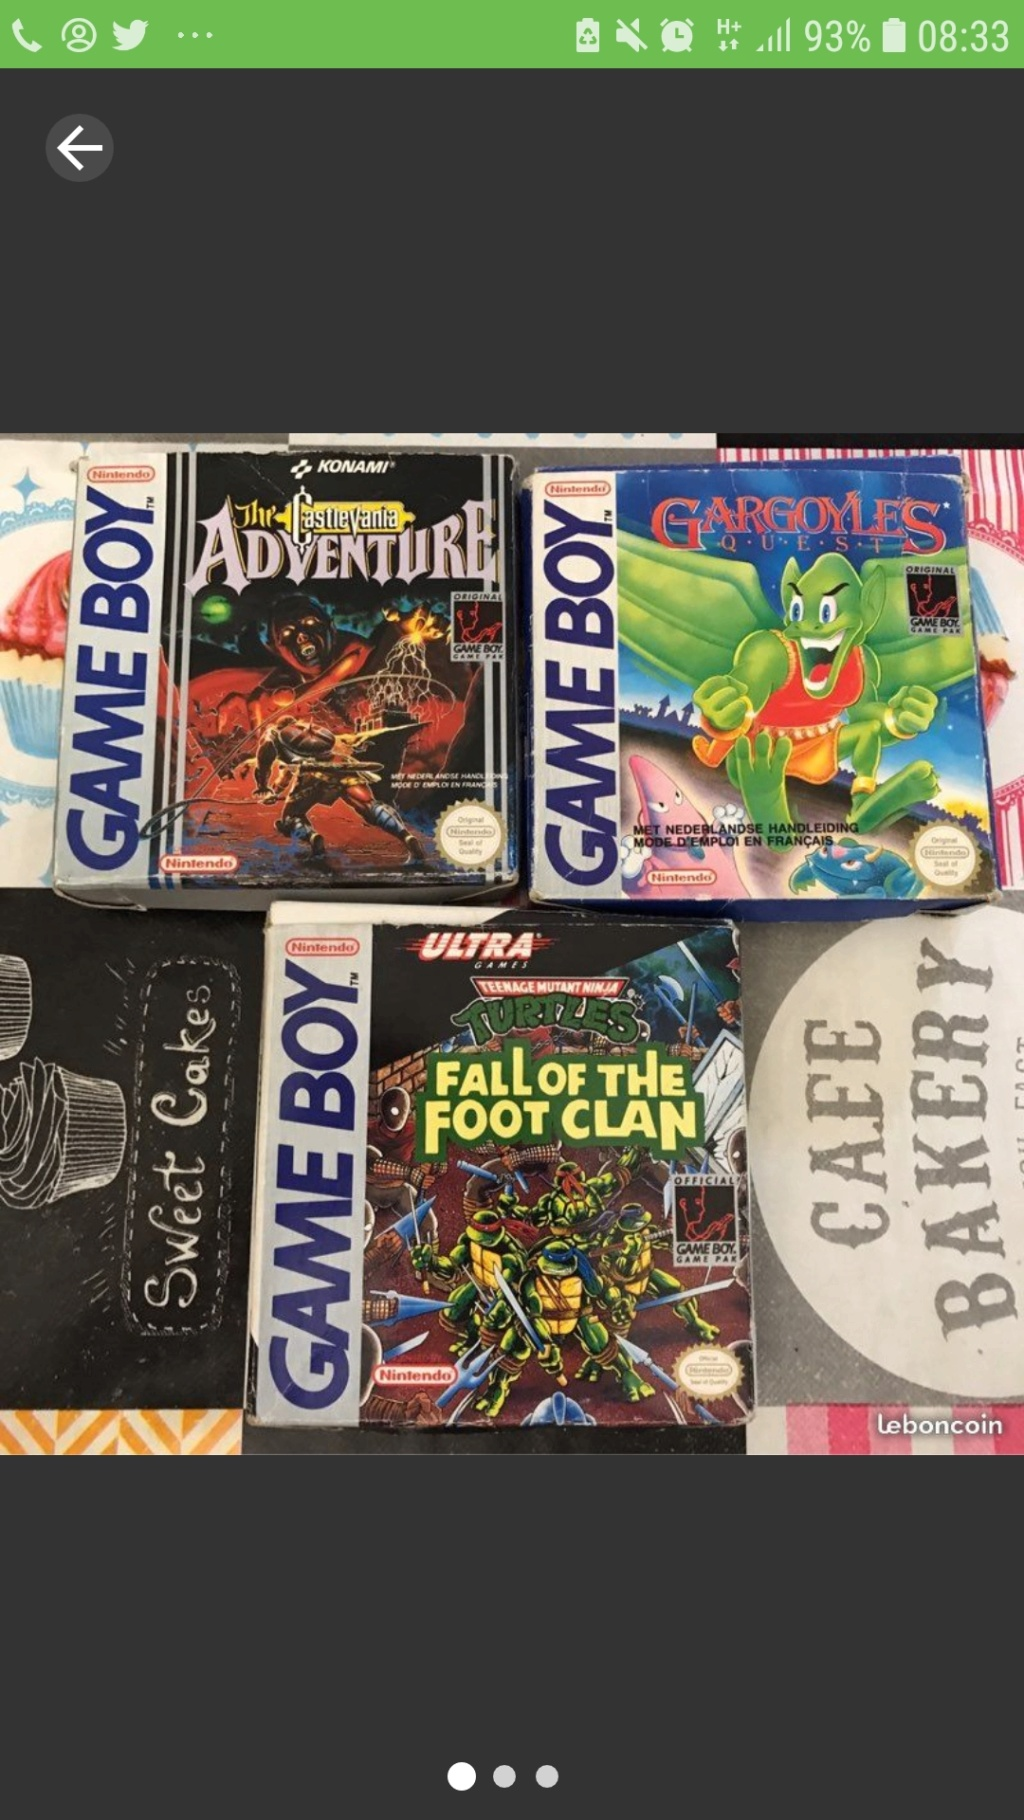 [ESTIM] Jeux Gameboy en boite Castlevania Gargoyle quest et Tortue Ninja Screen26